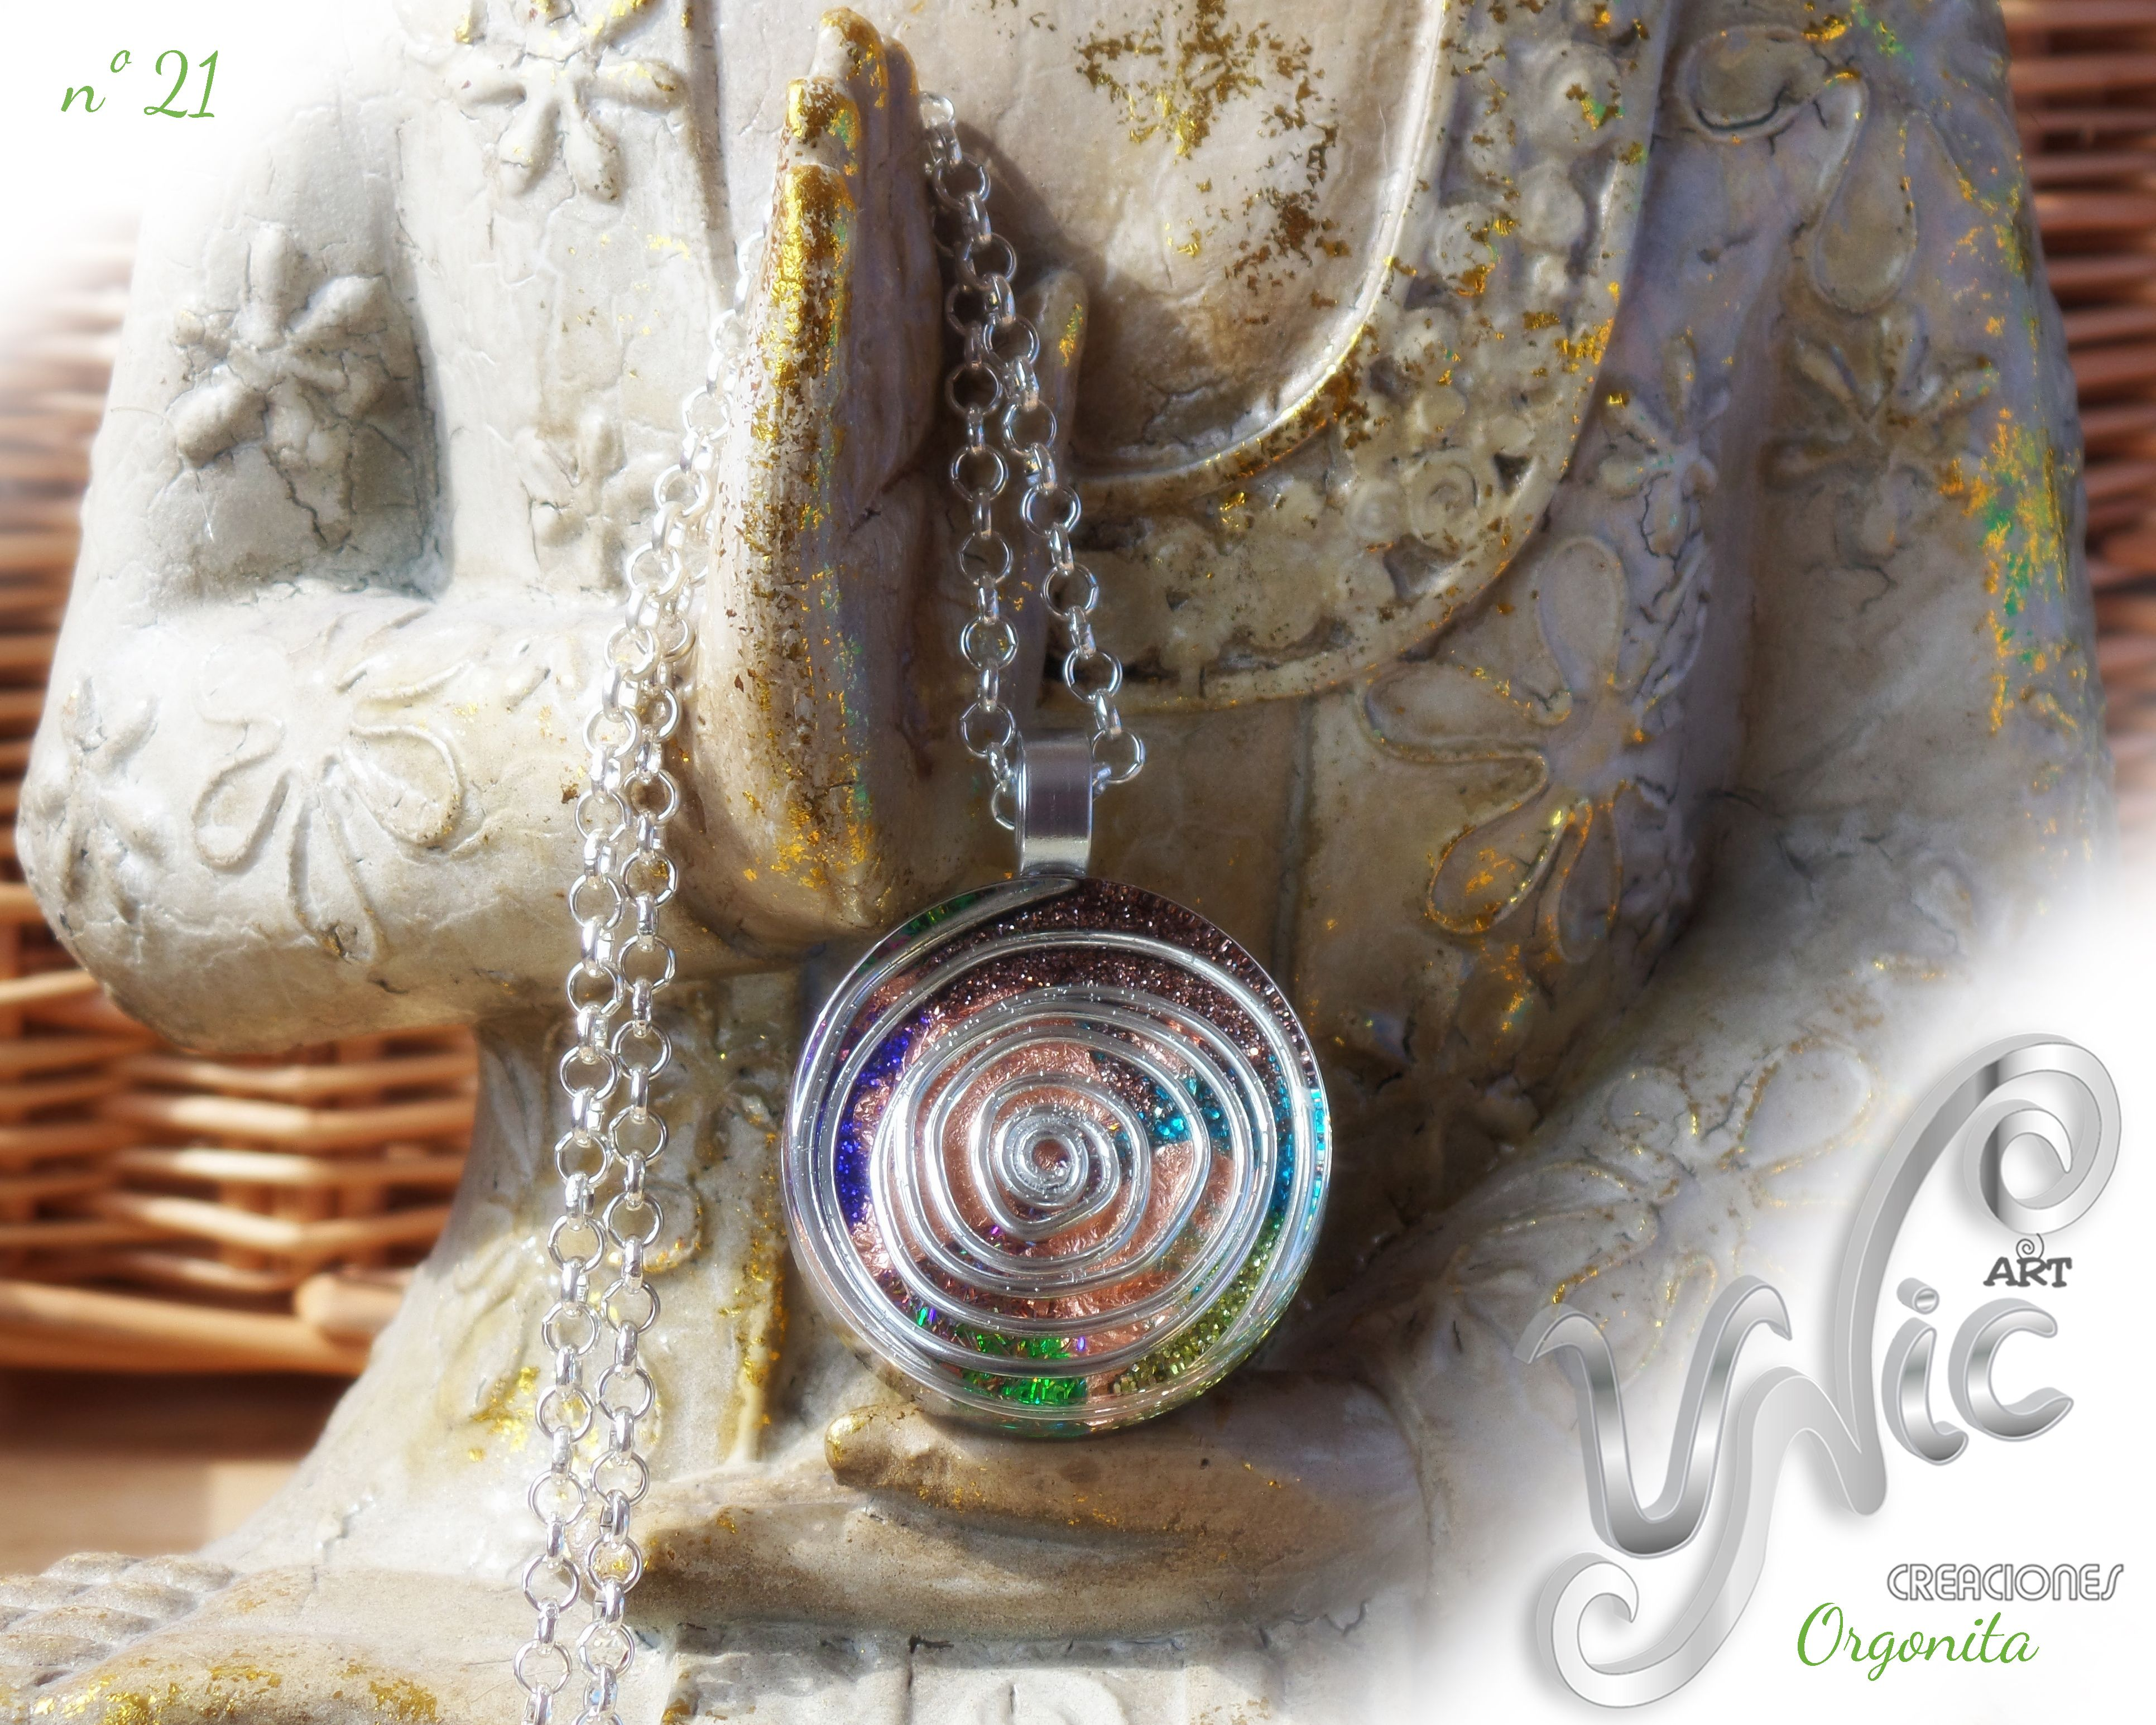 Orgonita nº 21  #orgonependant #orgonejewelry #orgoneenergy #etsyseller #etsygifts #resinjewelry #orgonit #orgonita #energypendant #handmadejewelry #reikijewelry #spiralpendant